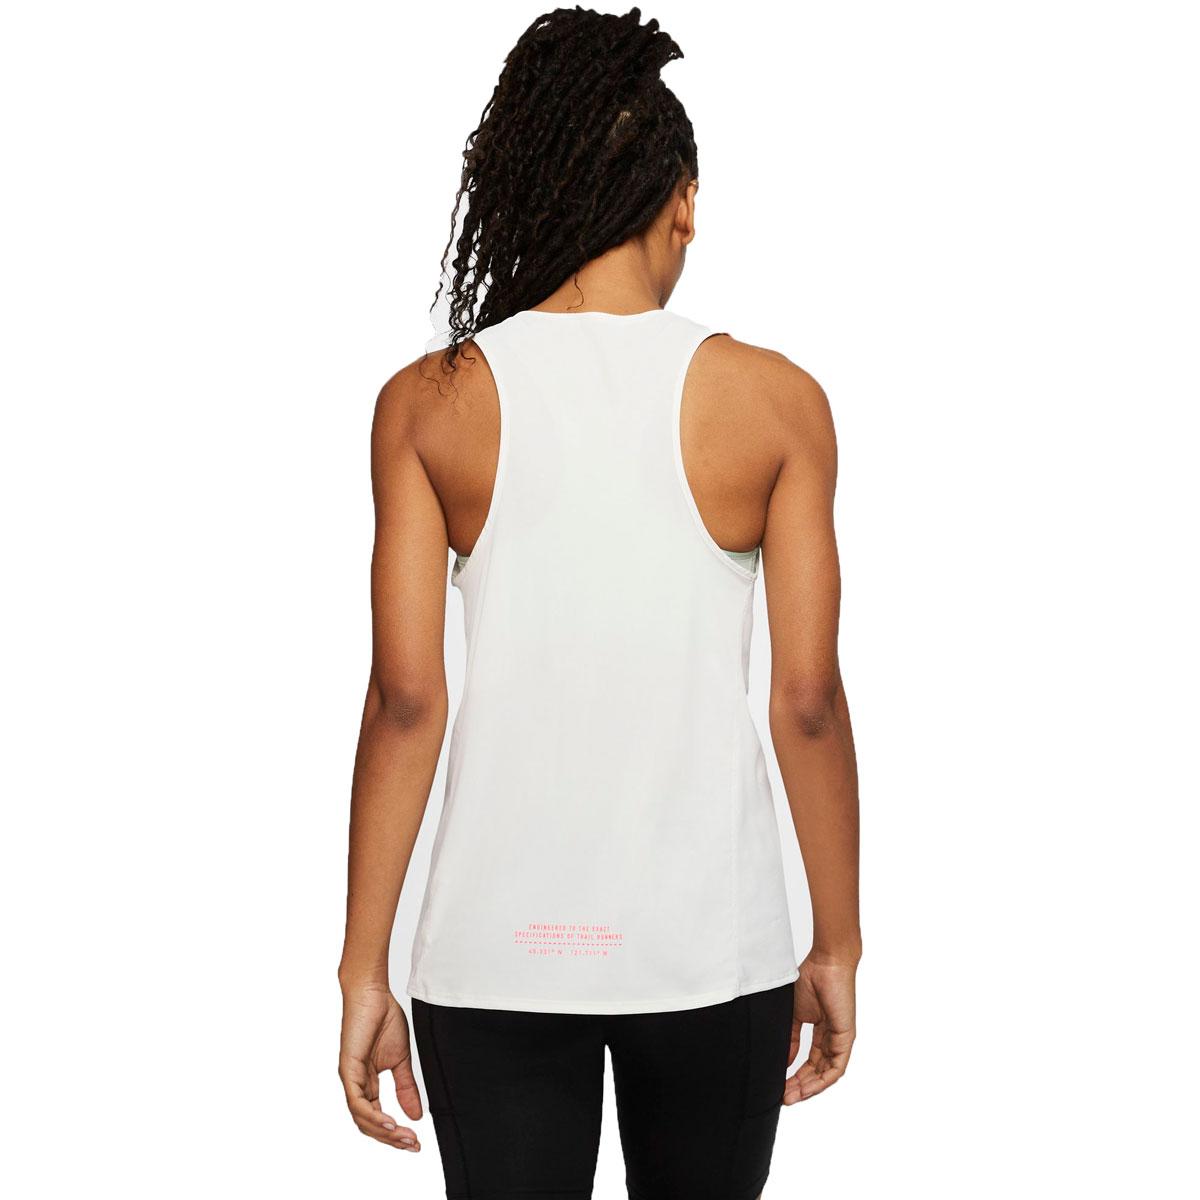 Women's Nike City Sleek Trail Running Tank - Color: Sail/Mint Foam/Laser Crimson - Size: XS, Sail/Mint Foam/Laser Crimson, large, image 2